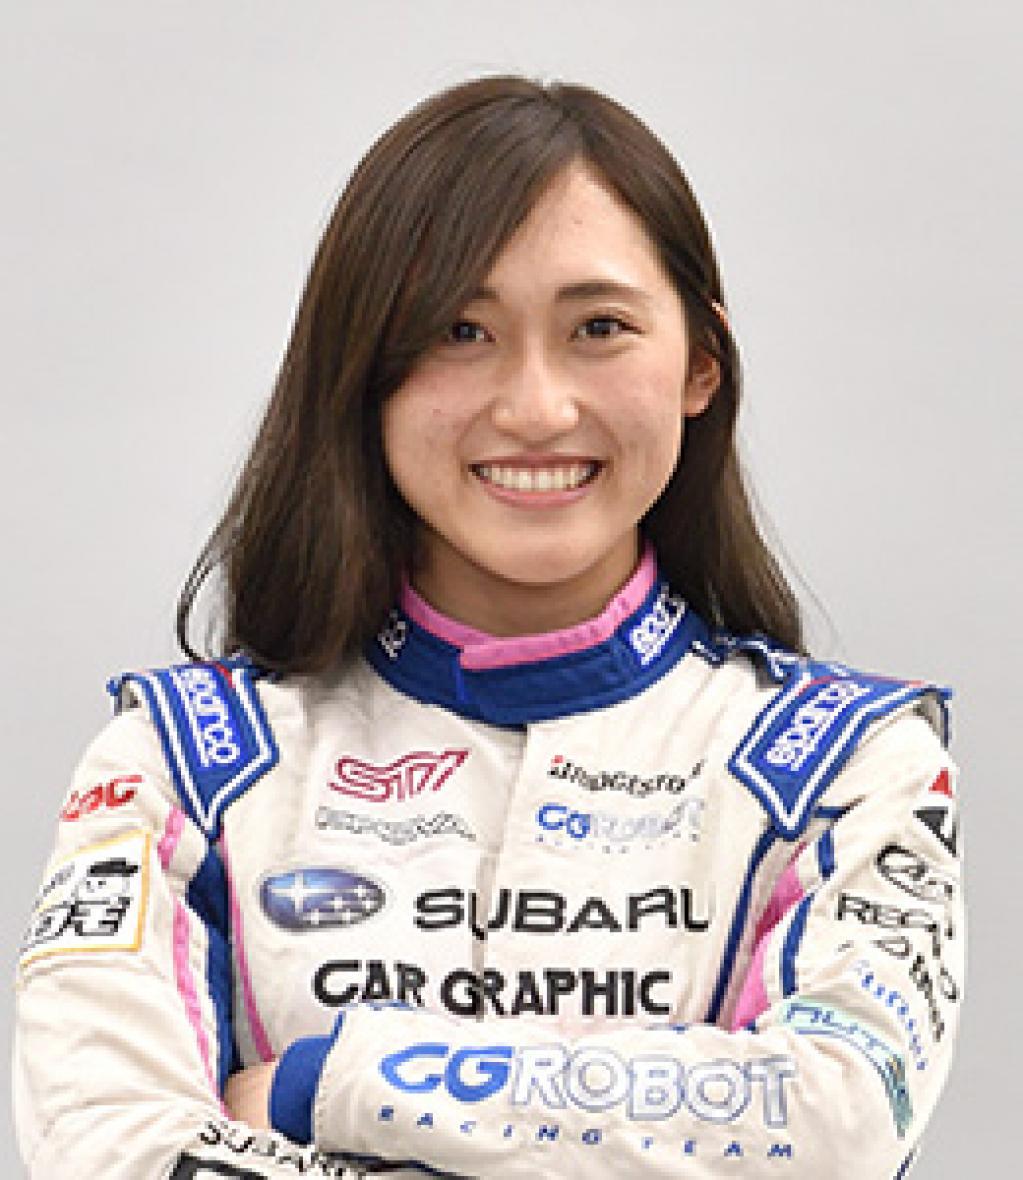 STI30周年イベント「STI MOTORSPORT DAY」は富士スピードウェイで3月10日開催!